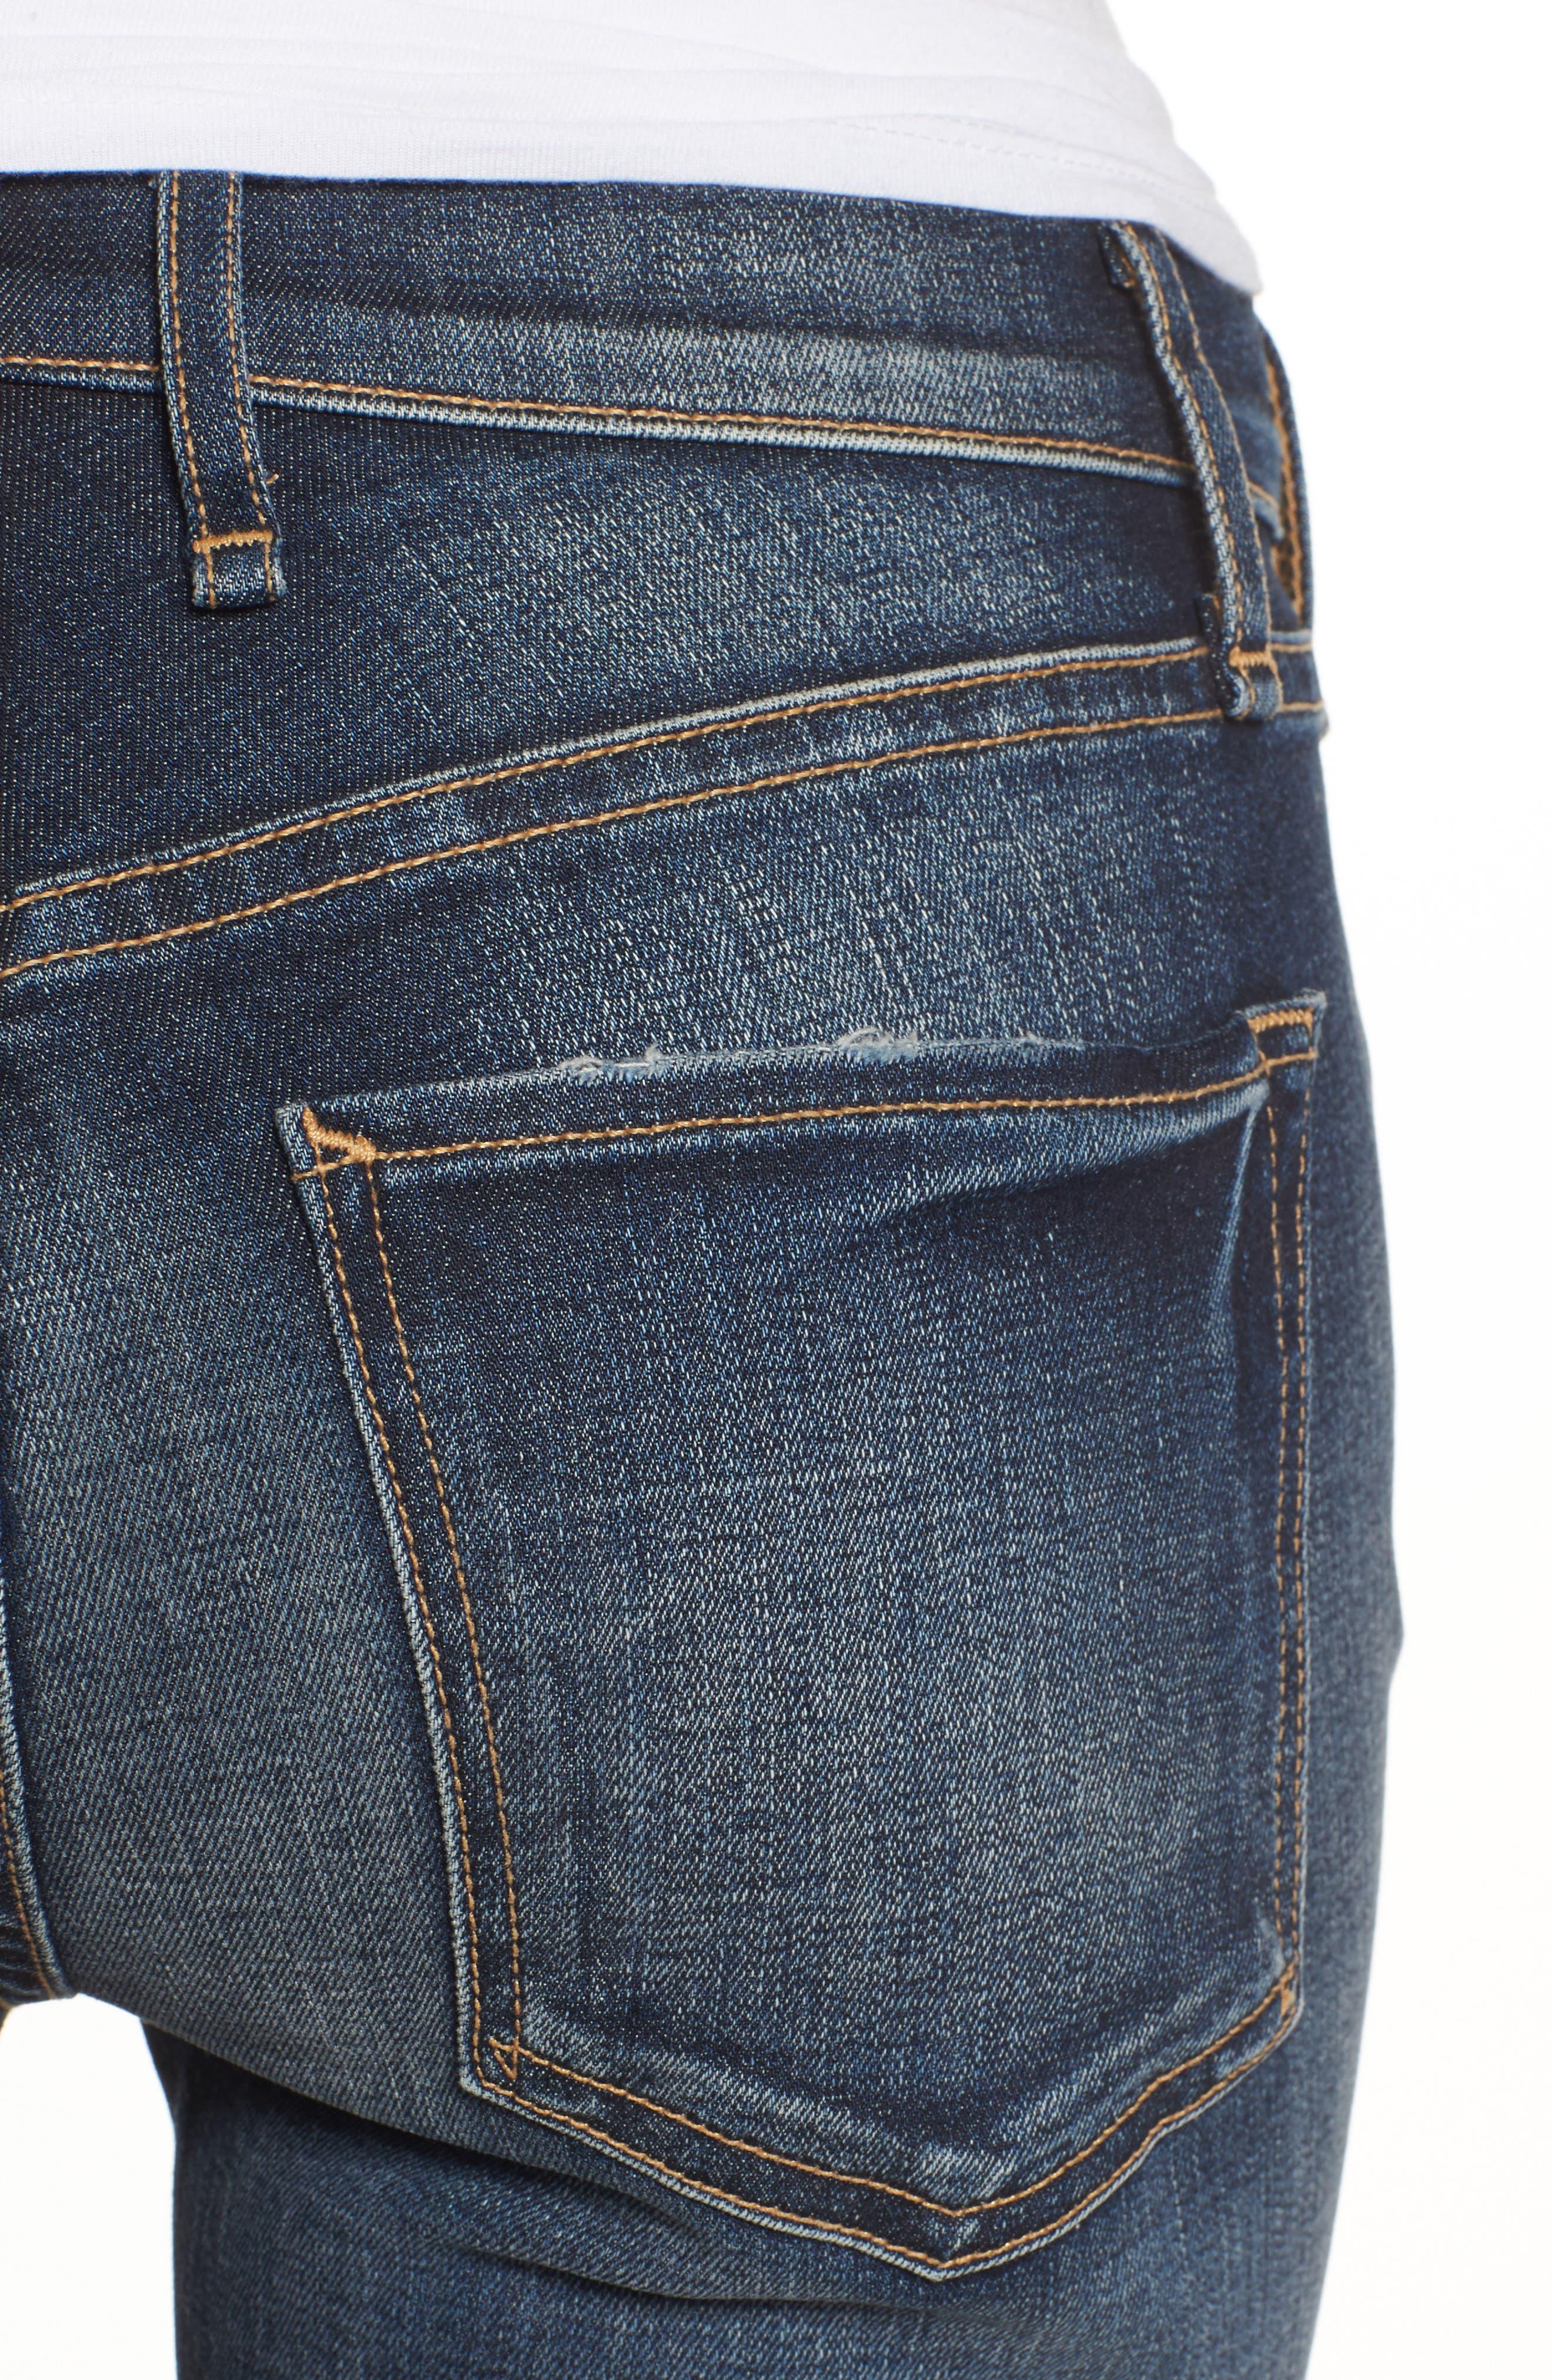 Alternate Image 4  - McGuire Newton High Waist Skinny Jeans (One Thousand Suns)